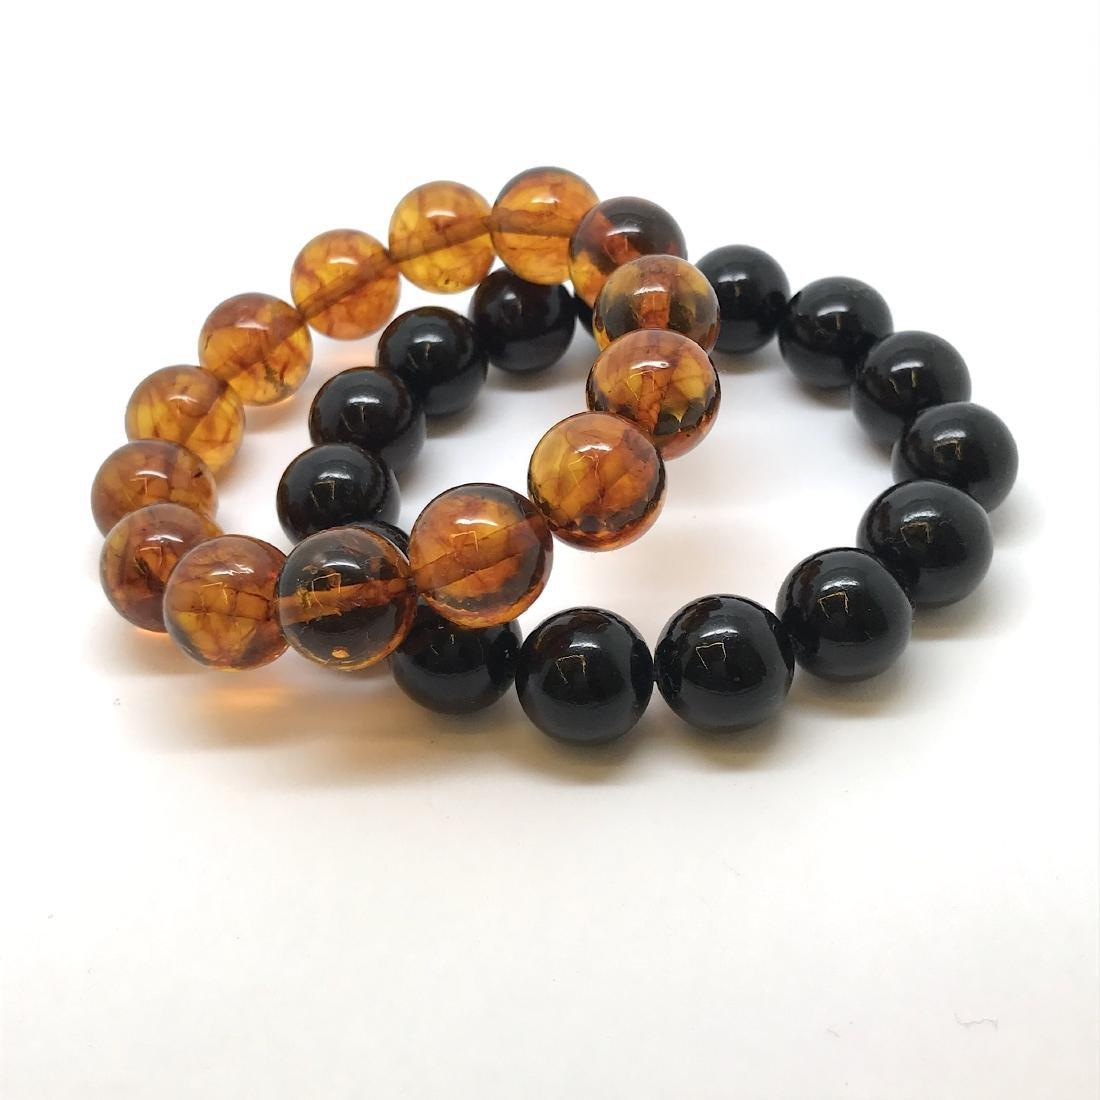 2x Baltic amber beads bracelets 30.4 gr